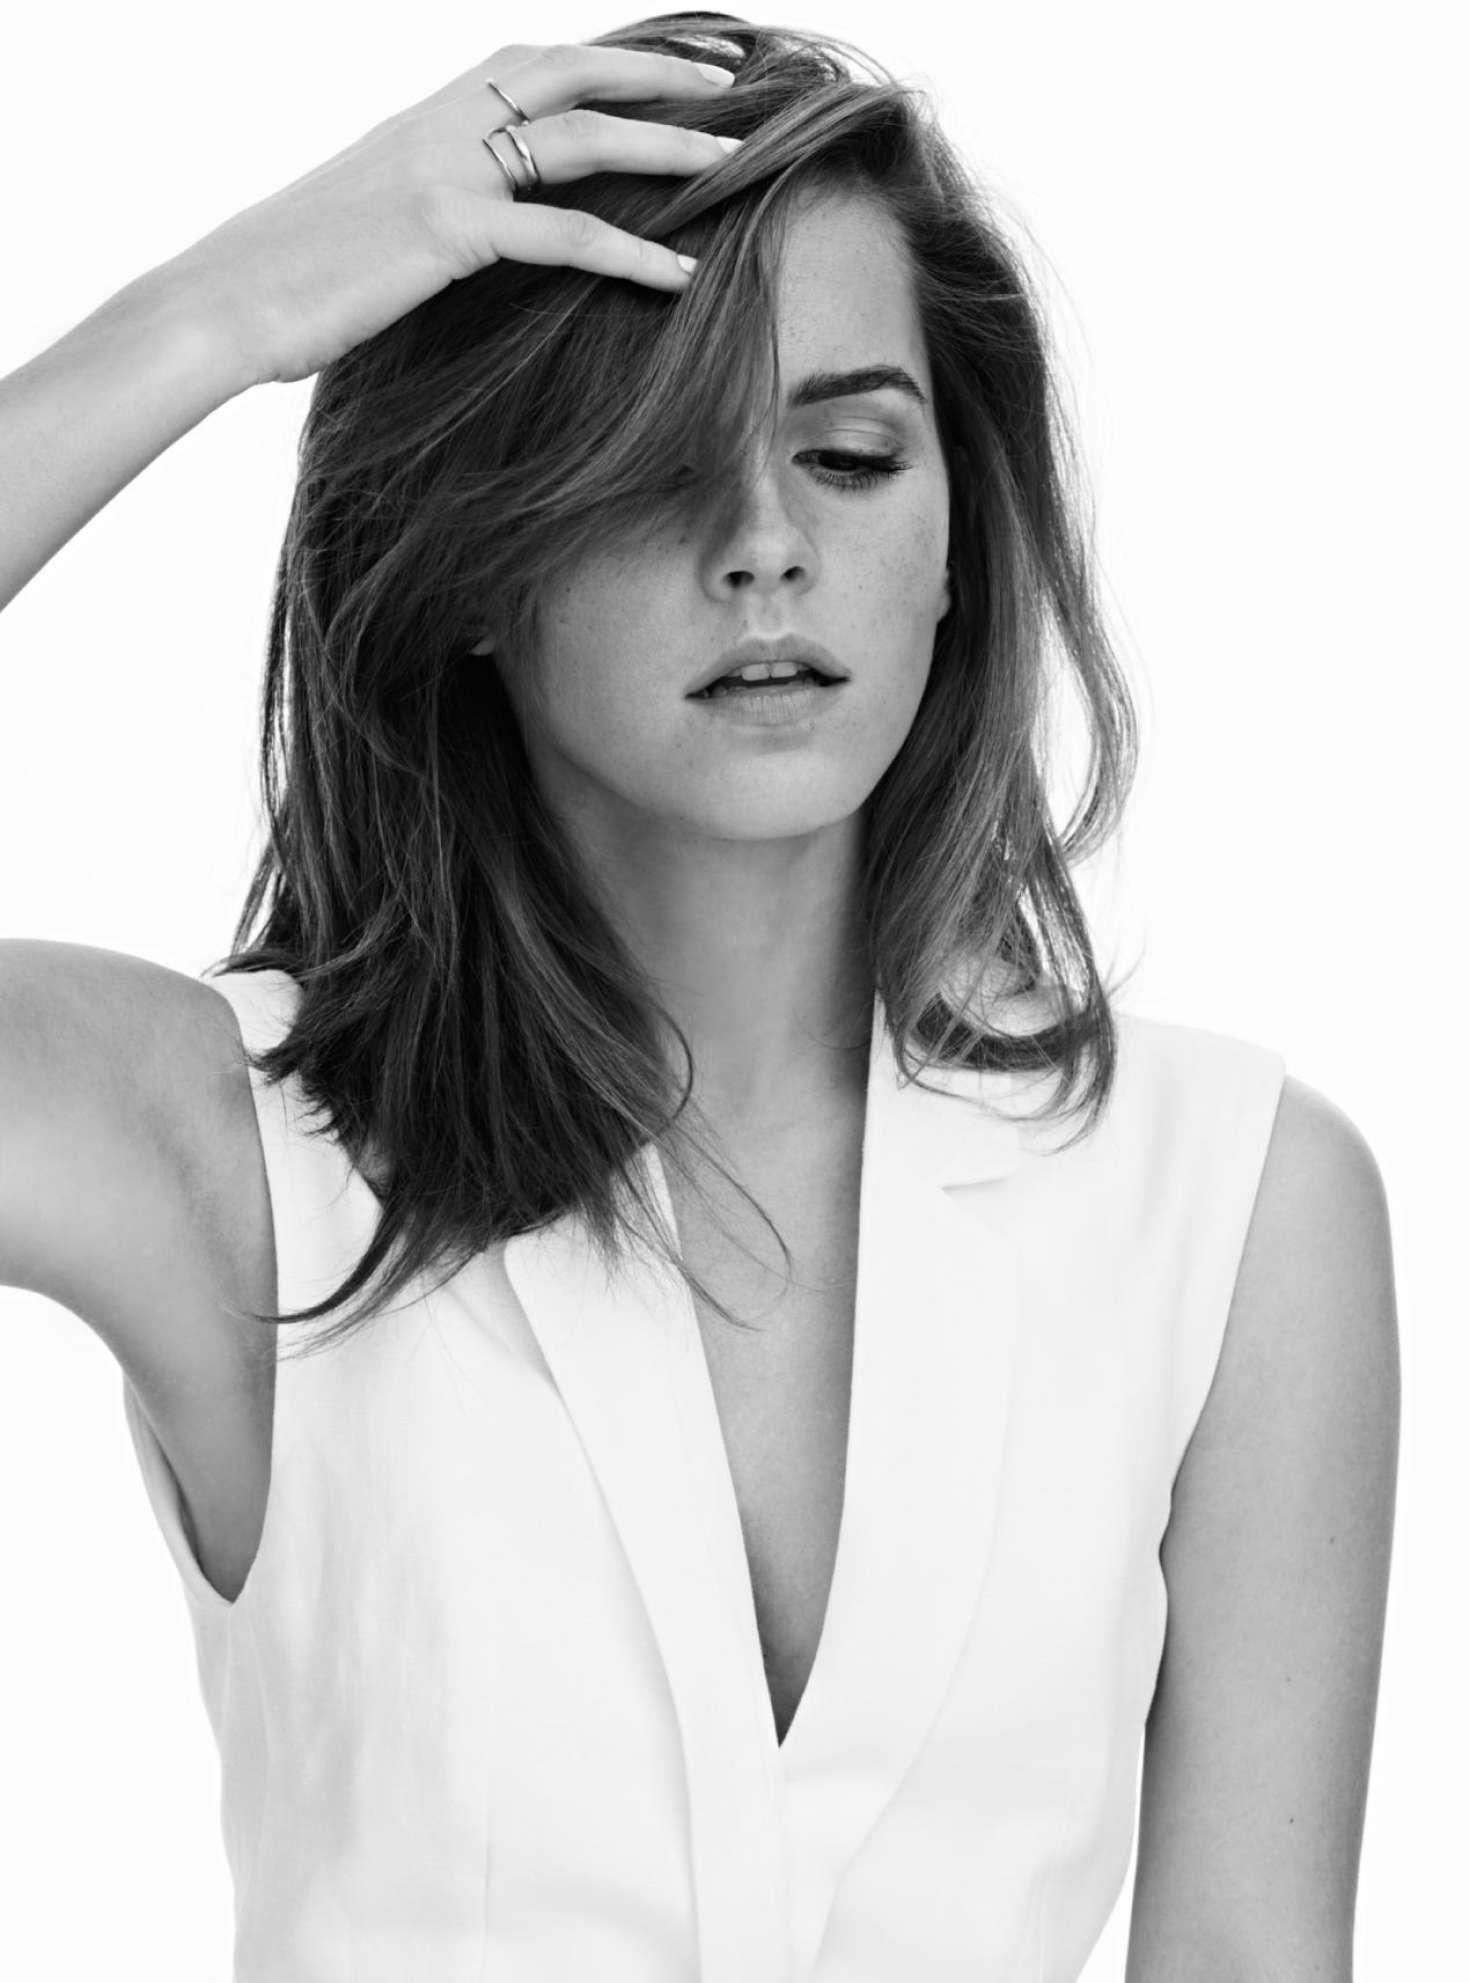 Emma Watson Photo 4466 Of 4691 Pics Wallpaper Photo